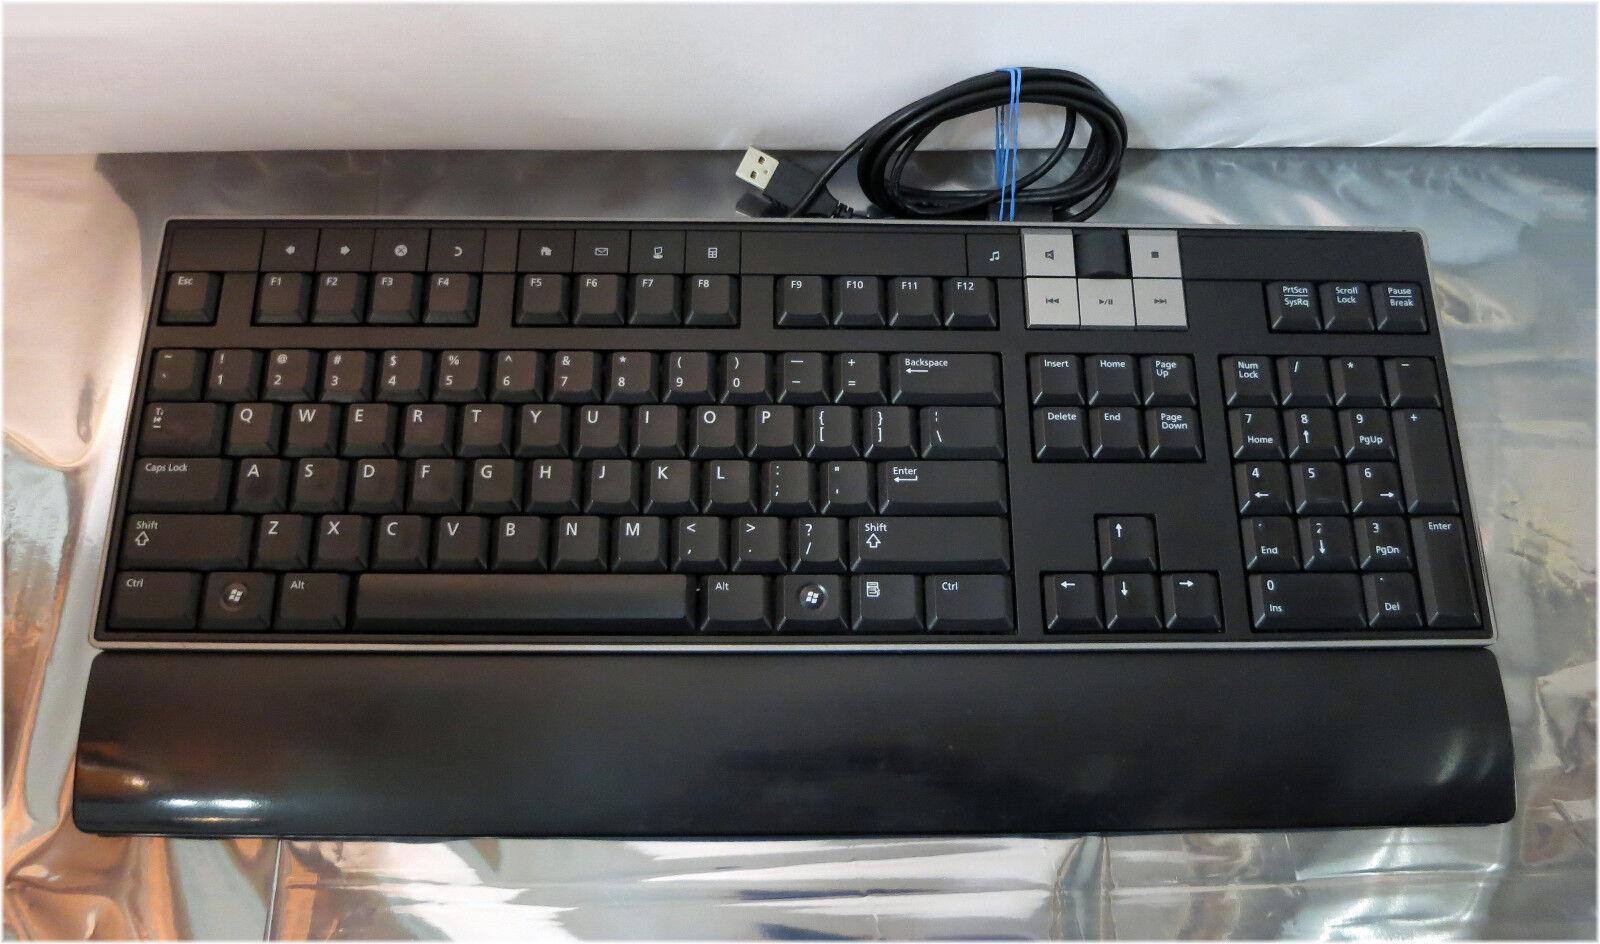 Dell, M/N: Y-U0003-DEL5, Wired PC Computer USB Multimedia Keyboard, DP/N: 0U473D. Buy it now for 15.08